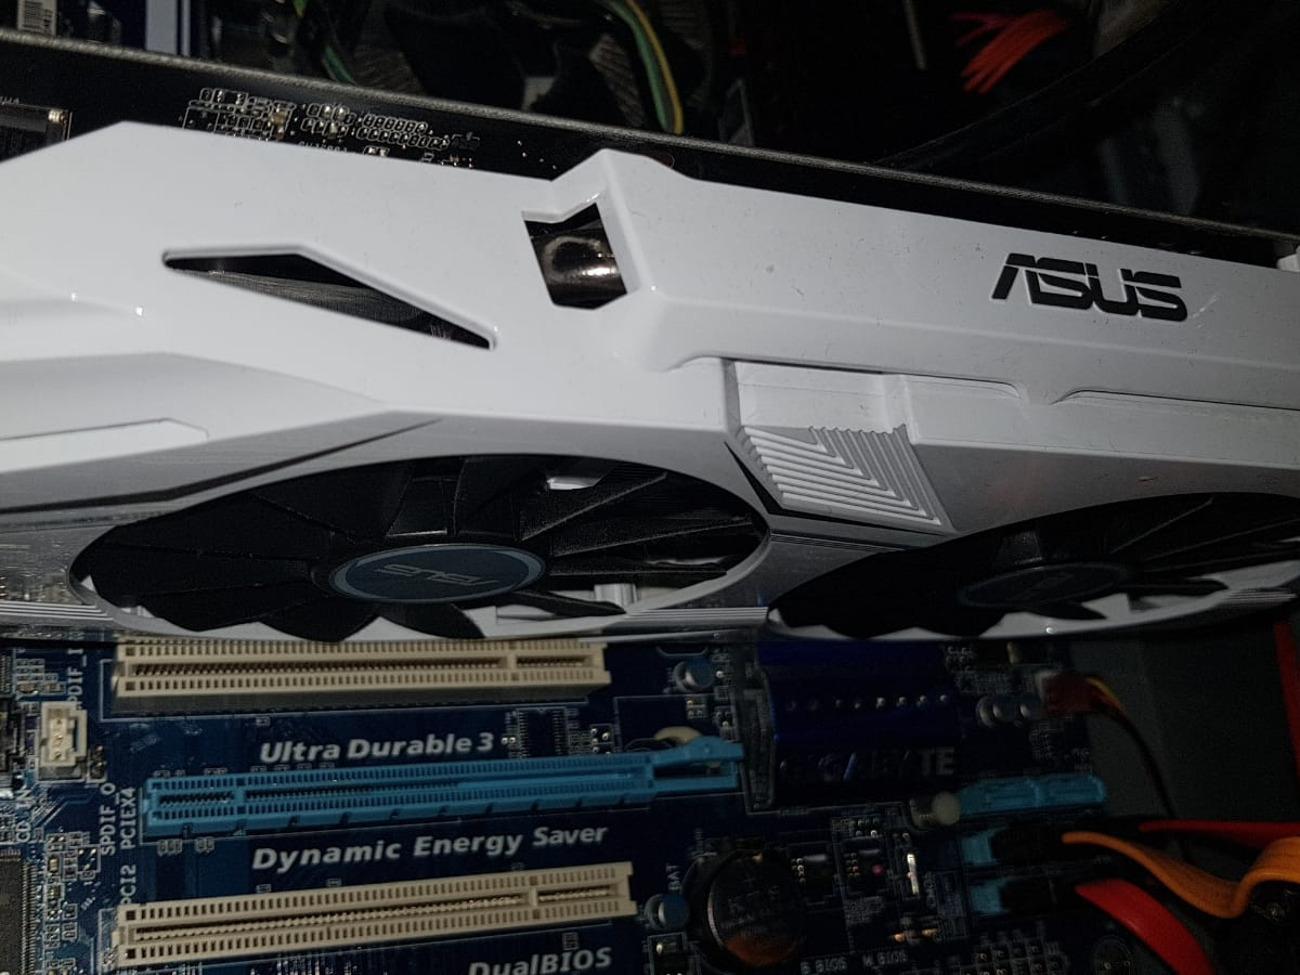 ASUS NVIDEA DUAL GTX 1060 6Gb, used less than 3 days + box